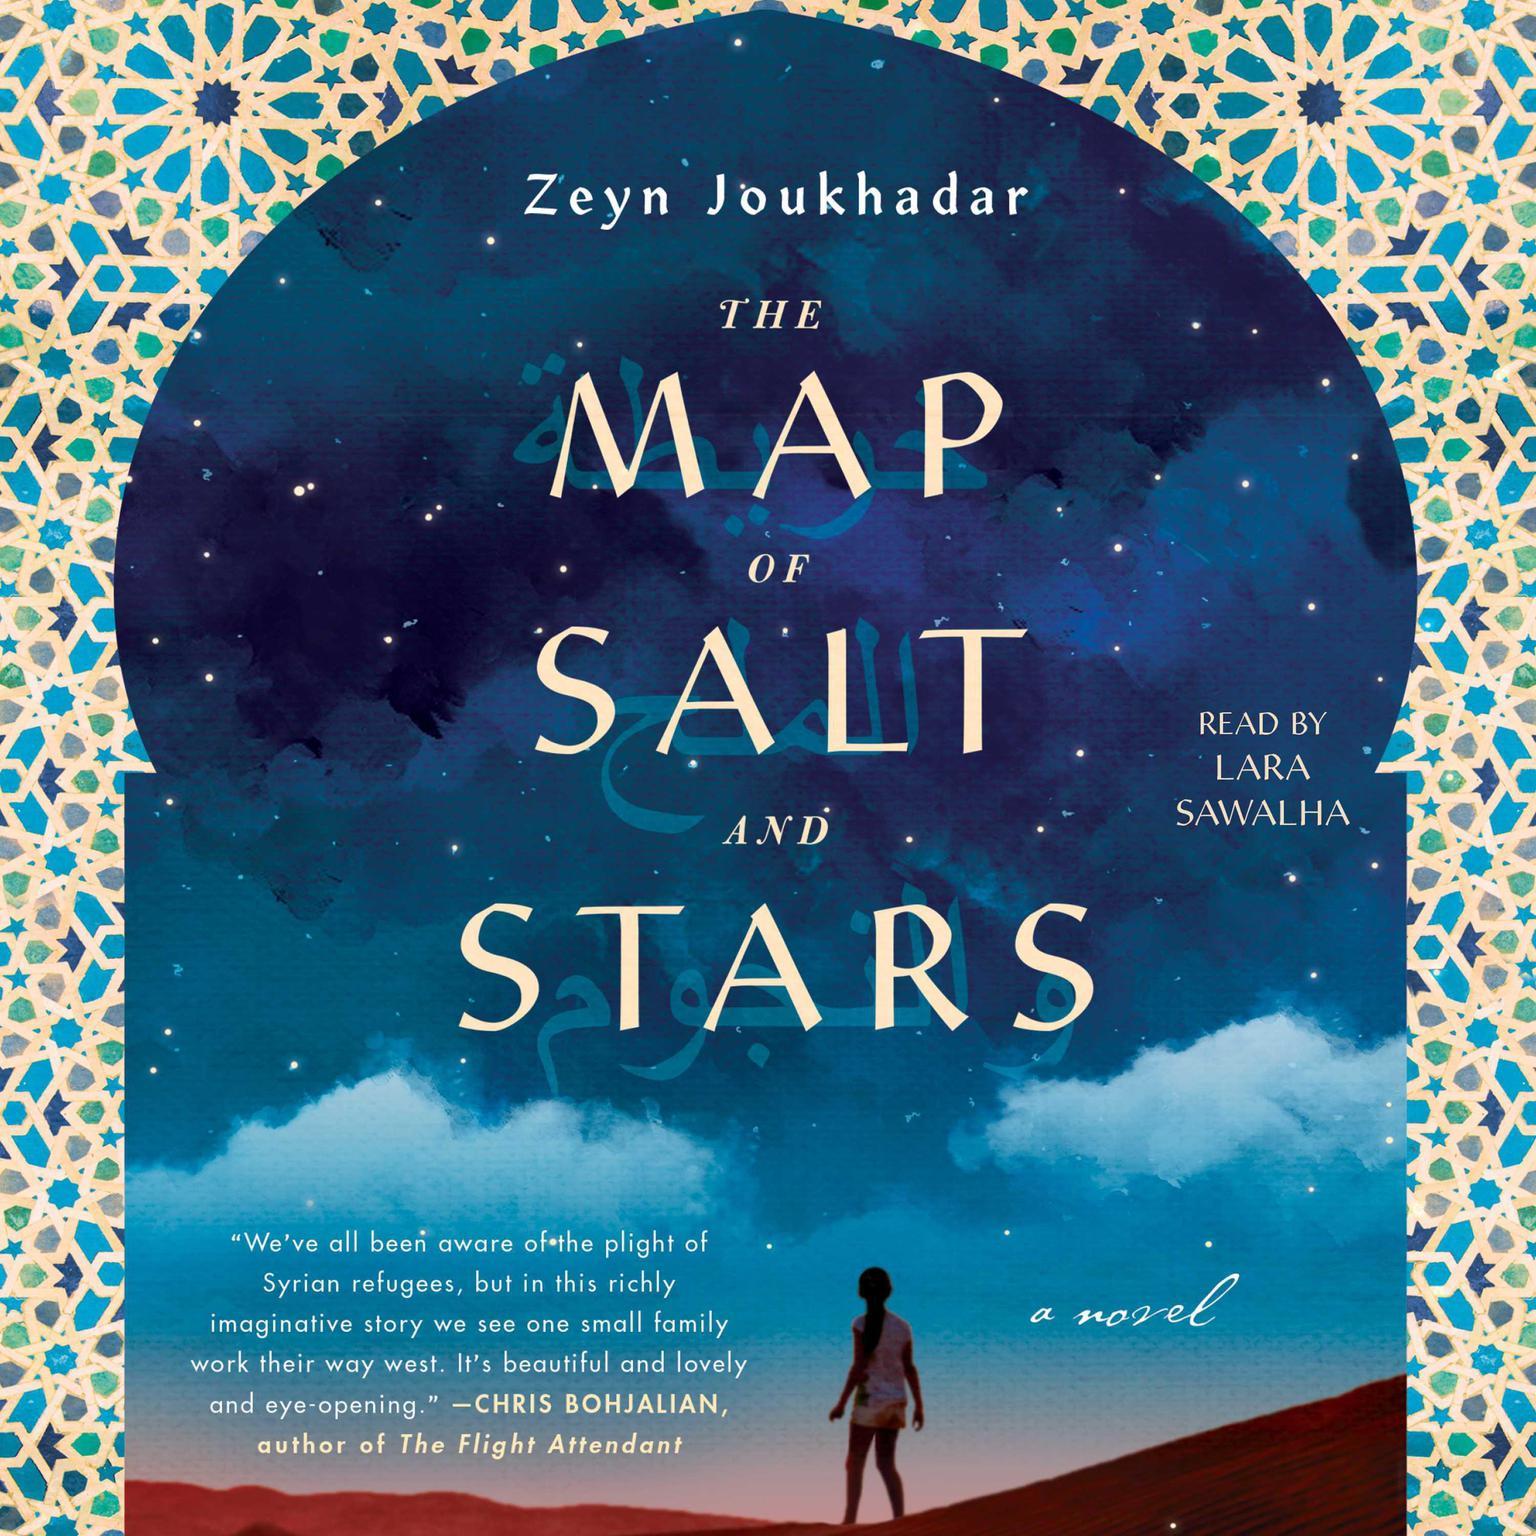 The Map of Salt and Stars: A Novel Audiobook, by Zeyn Joukhadar